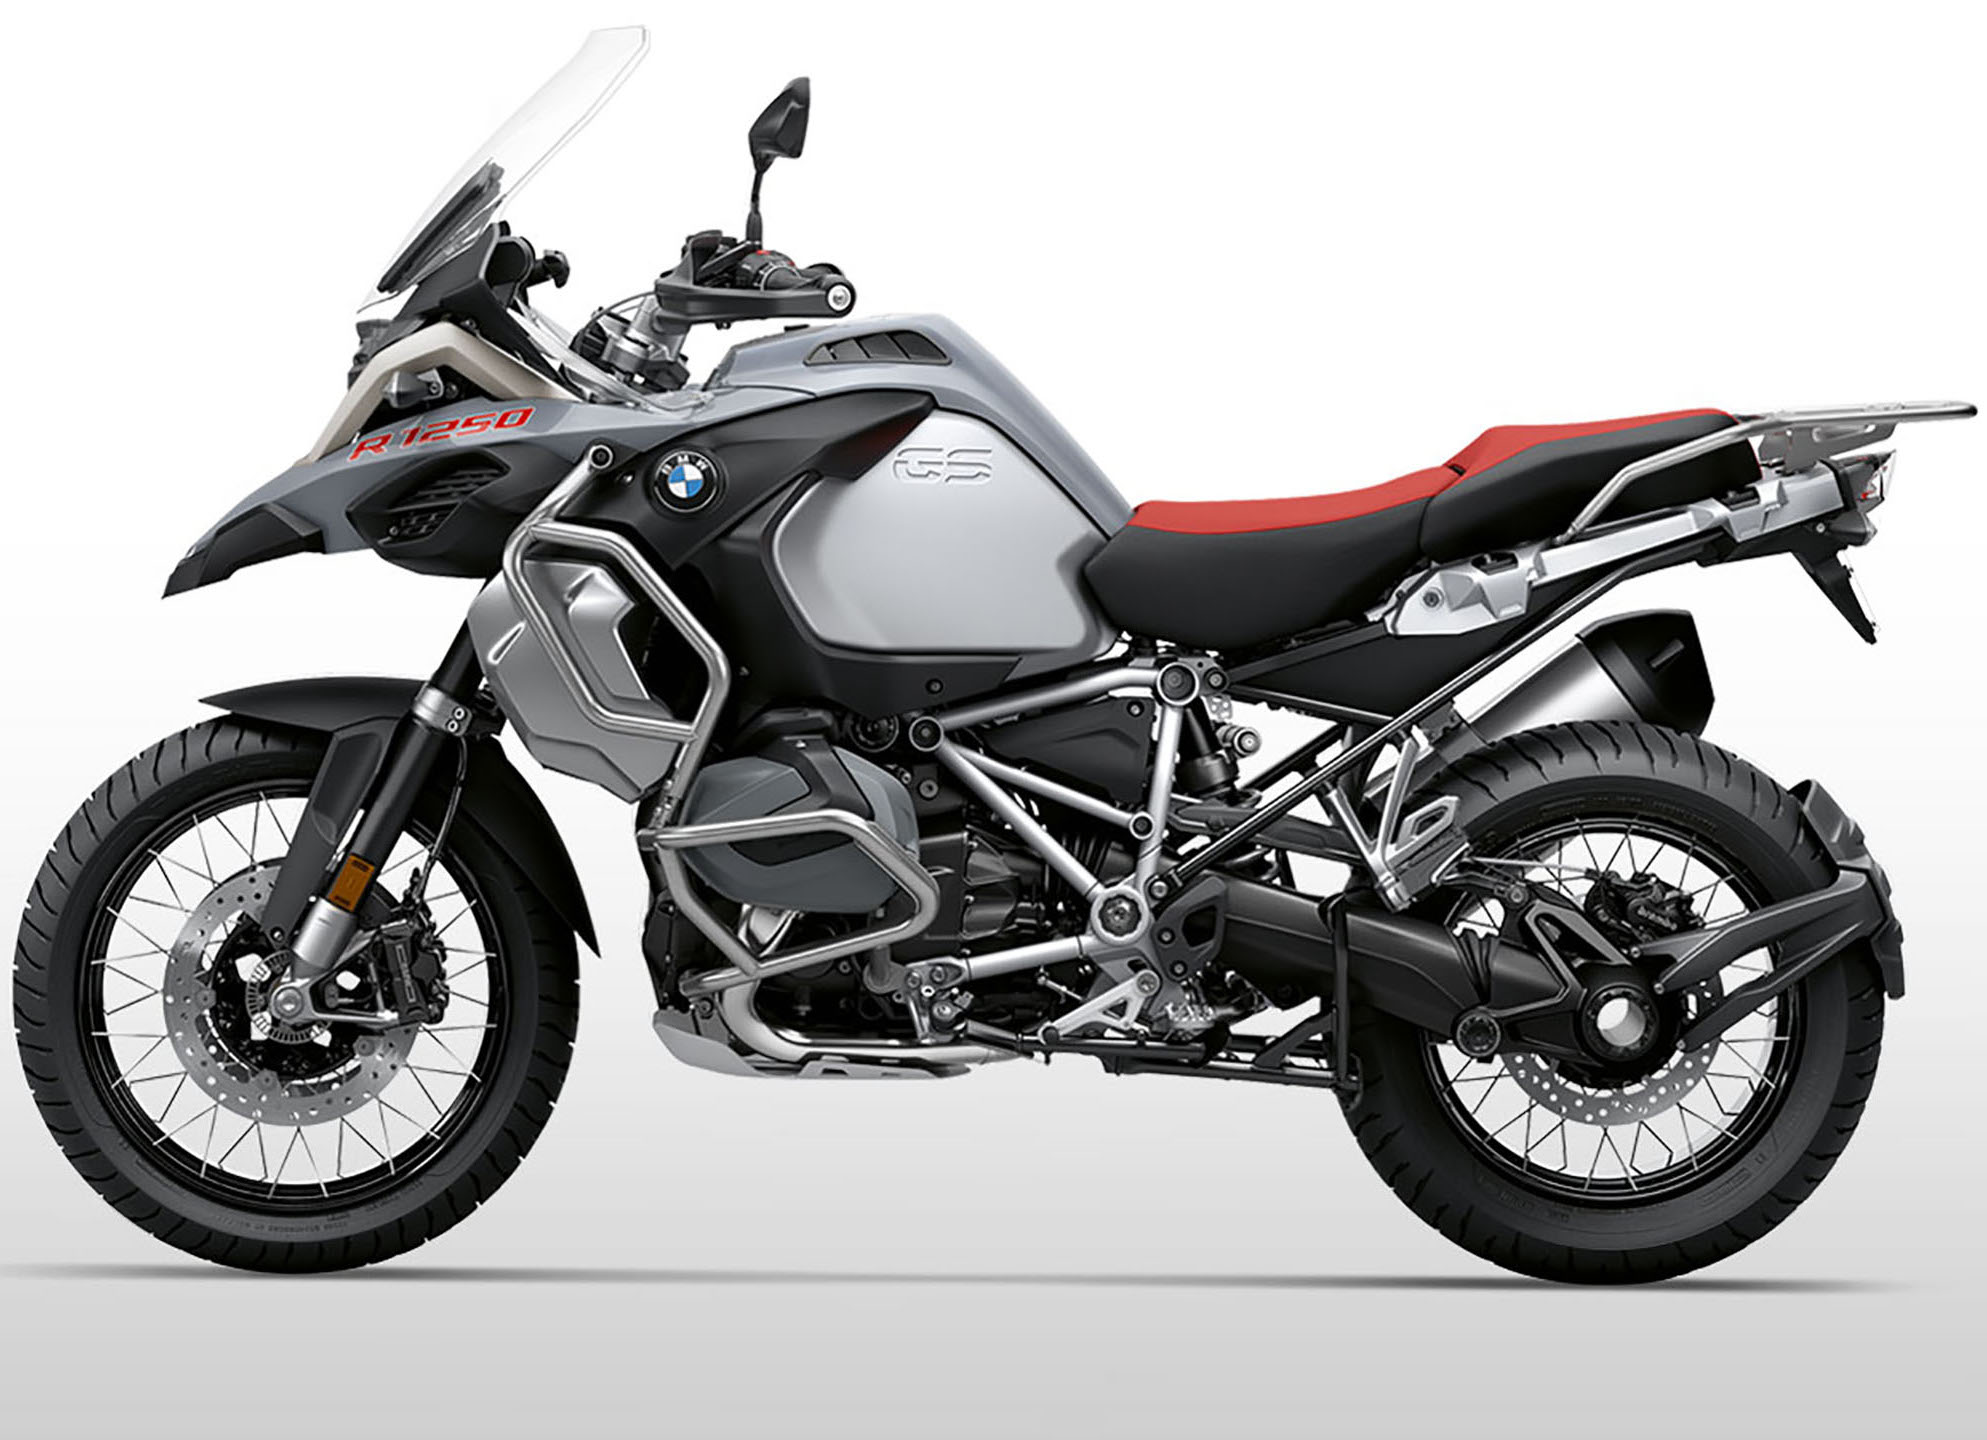 bmw-motorrad-r-1250-gs-adventure